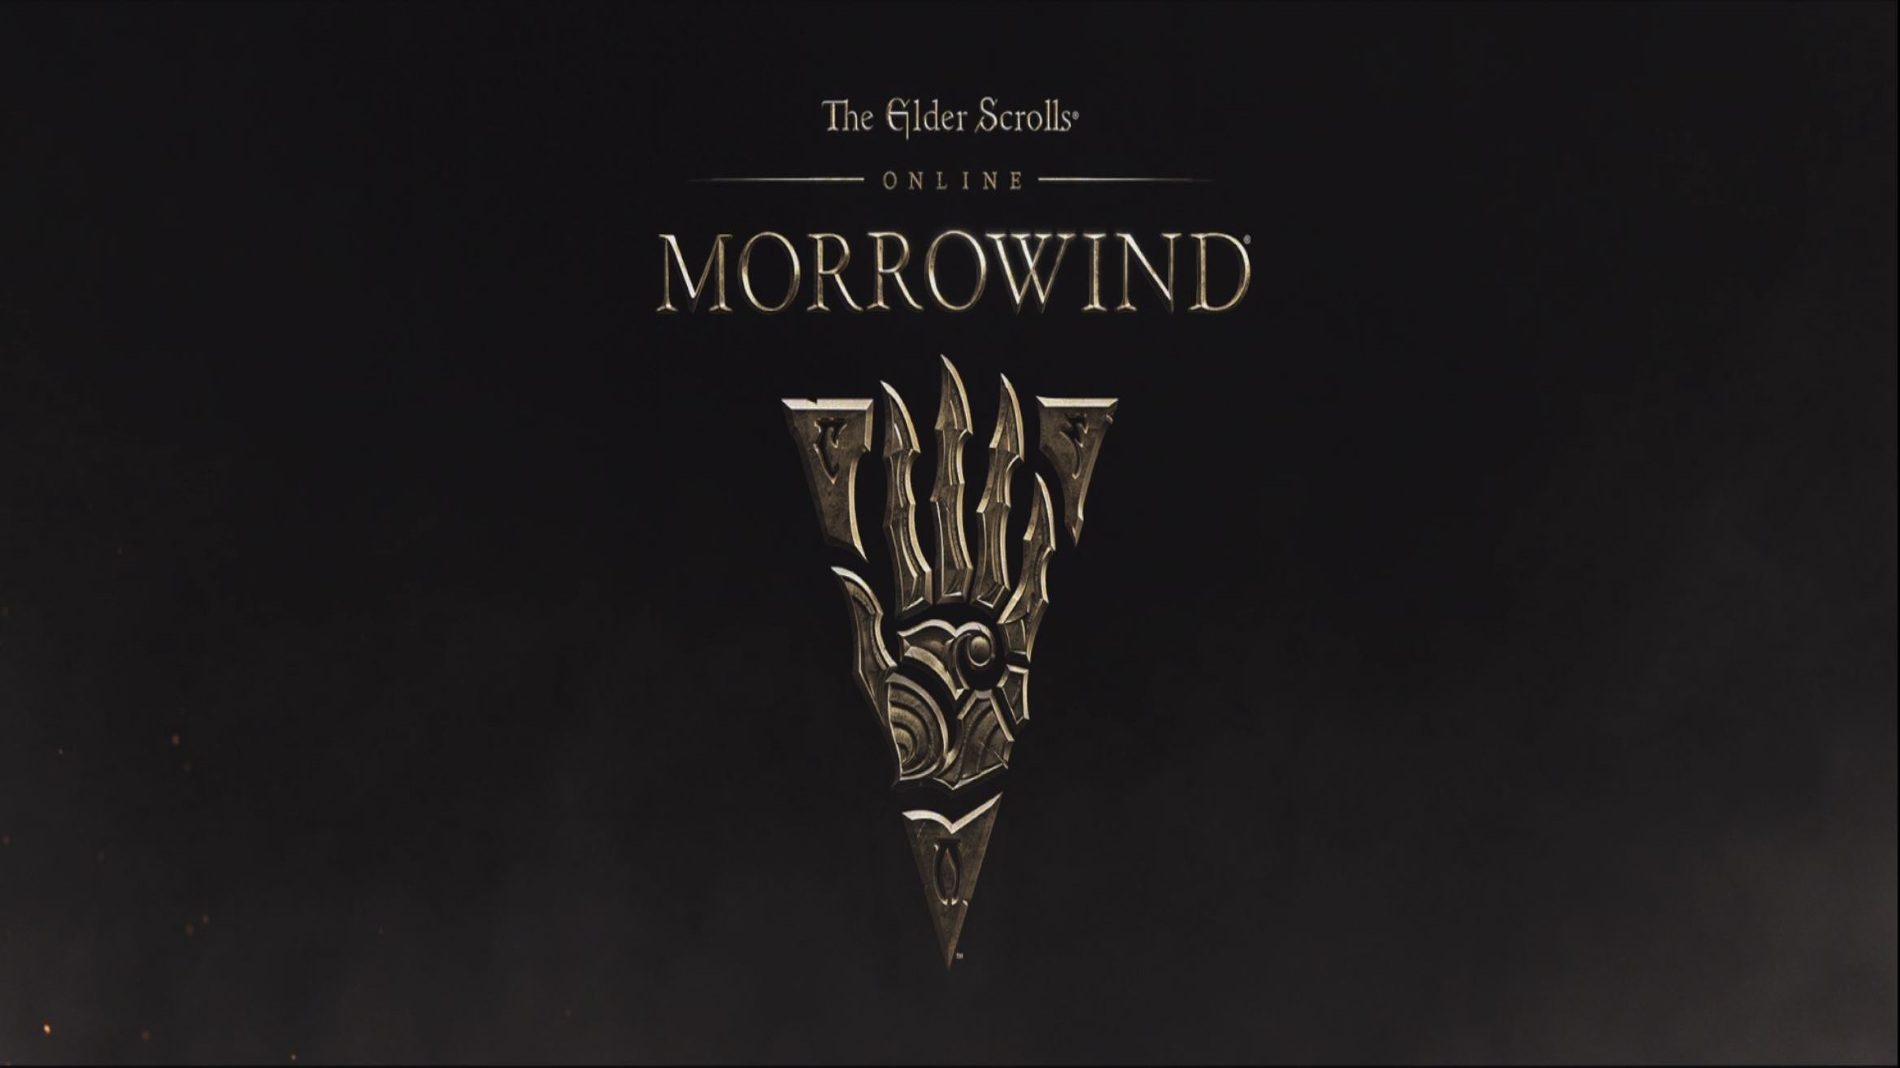 The Elder Scrolls Online: Morrowind-Addon kommt, bringt 5. Klasse Hüter